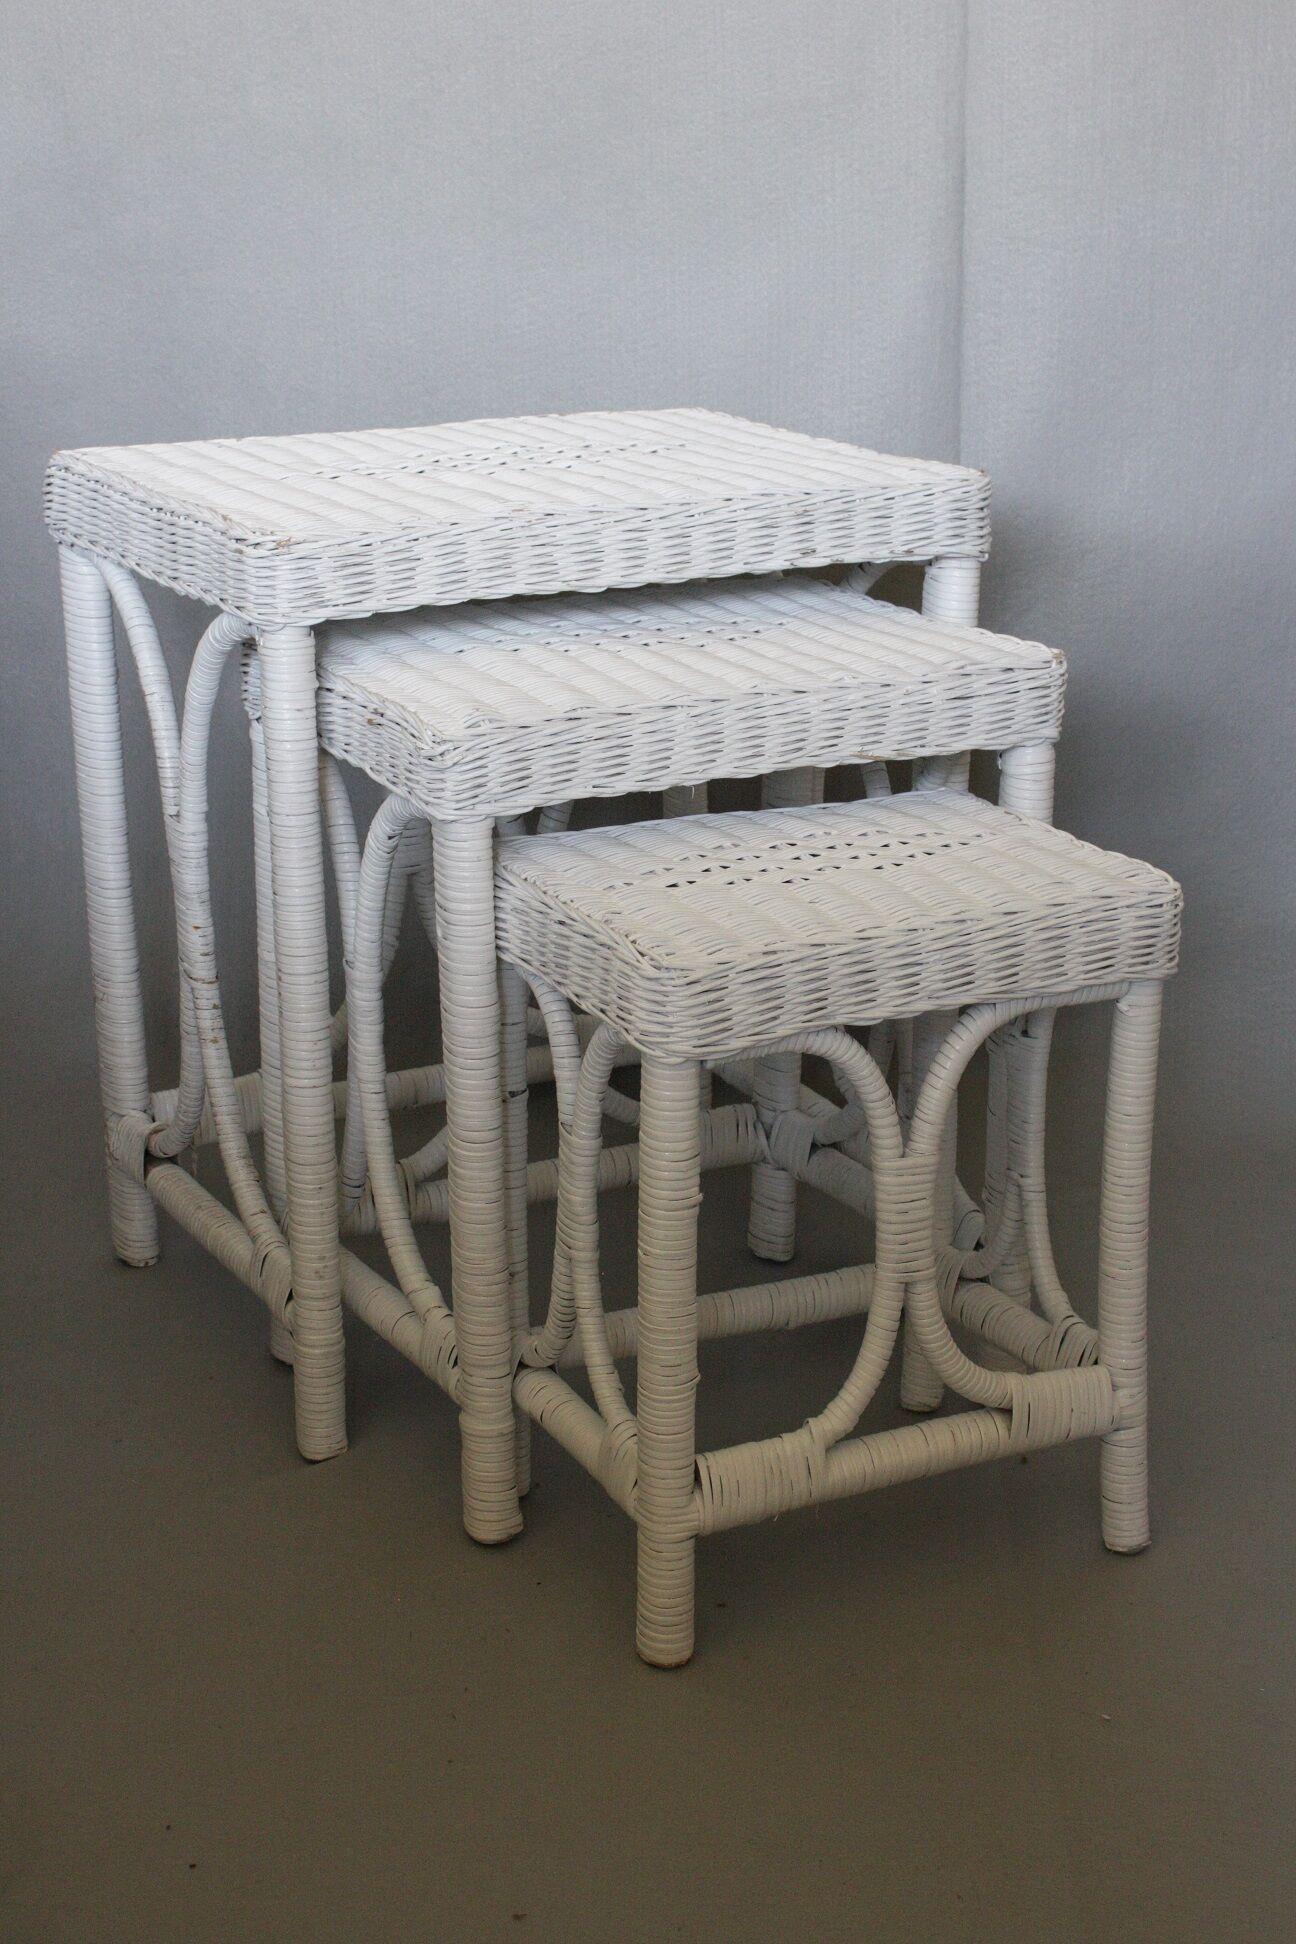 Svetlana Wicker 3 Piece Nesting Tables Color: White